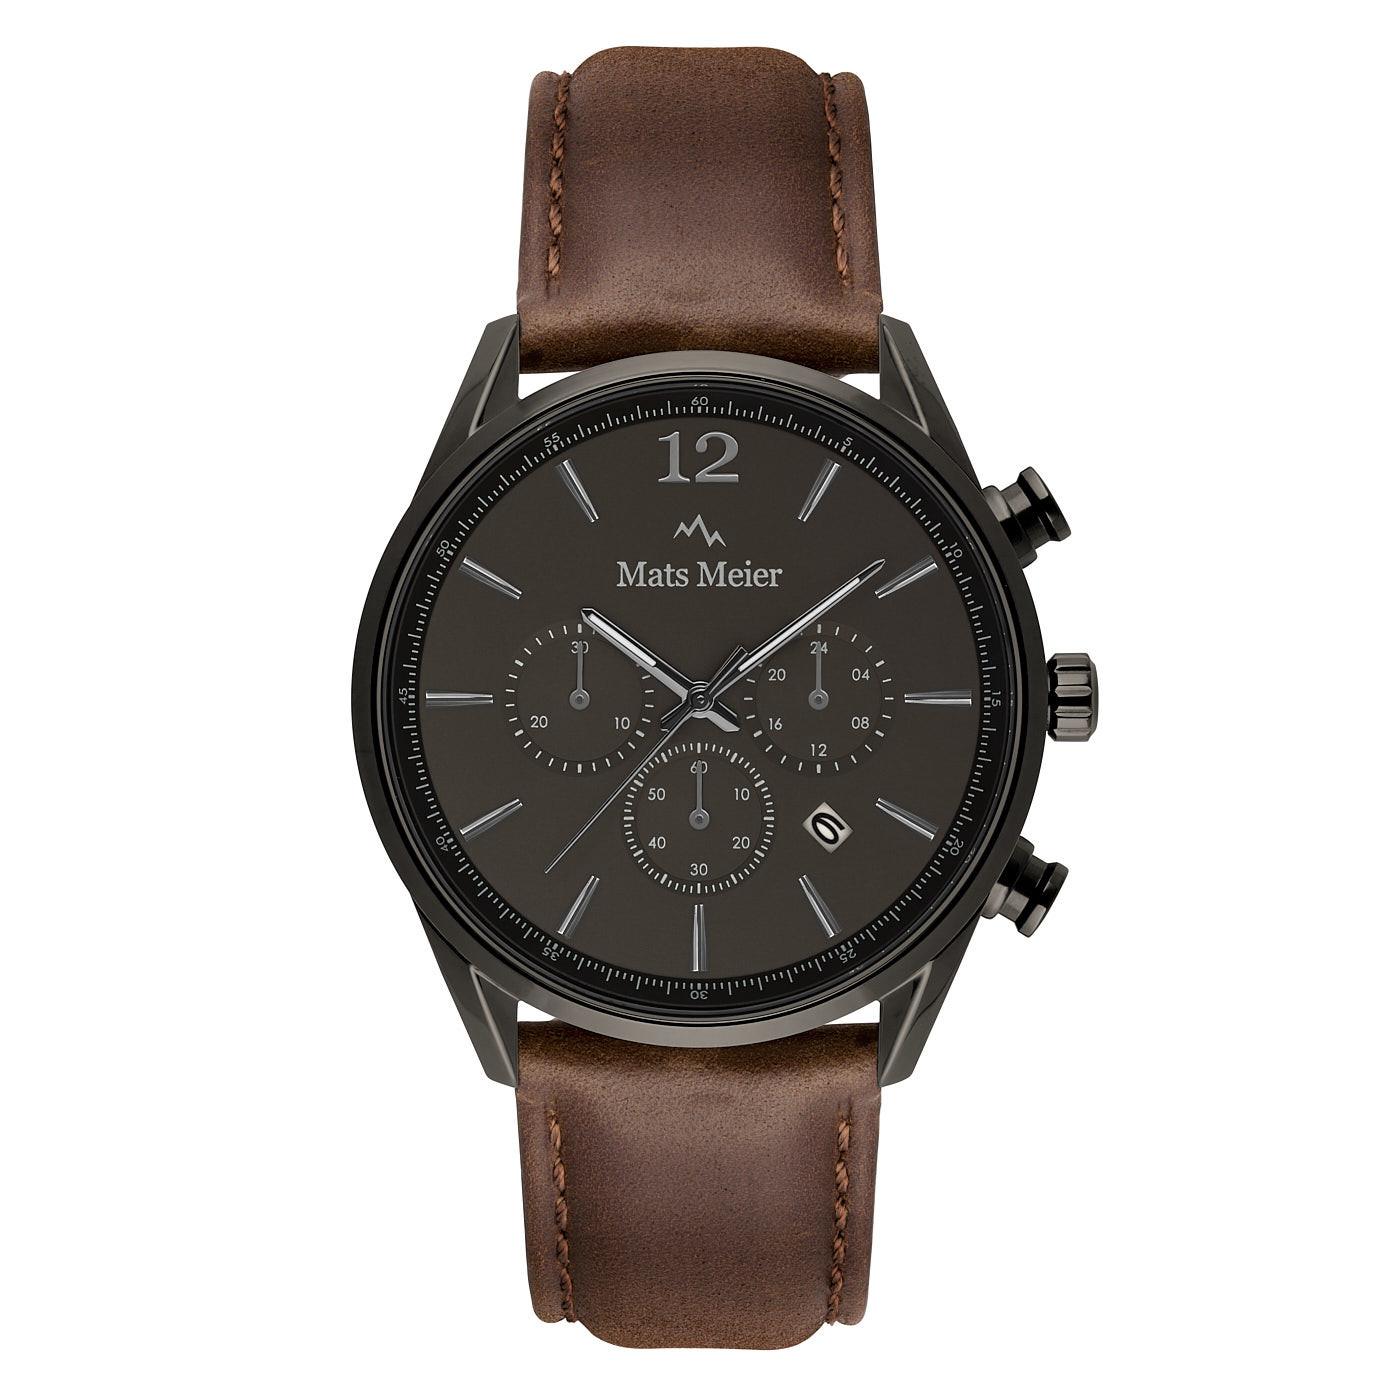 Mats Meier Grand Cornier chronograph mens watch gunmetal / dark brown